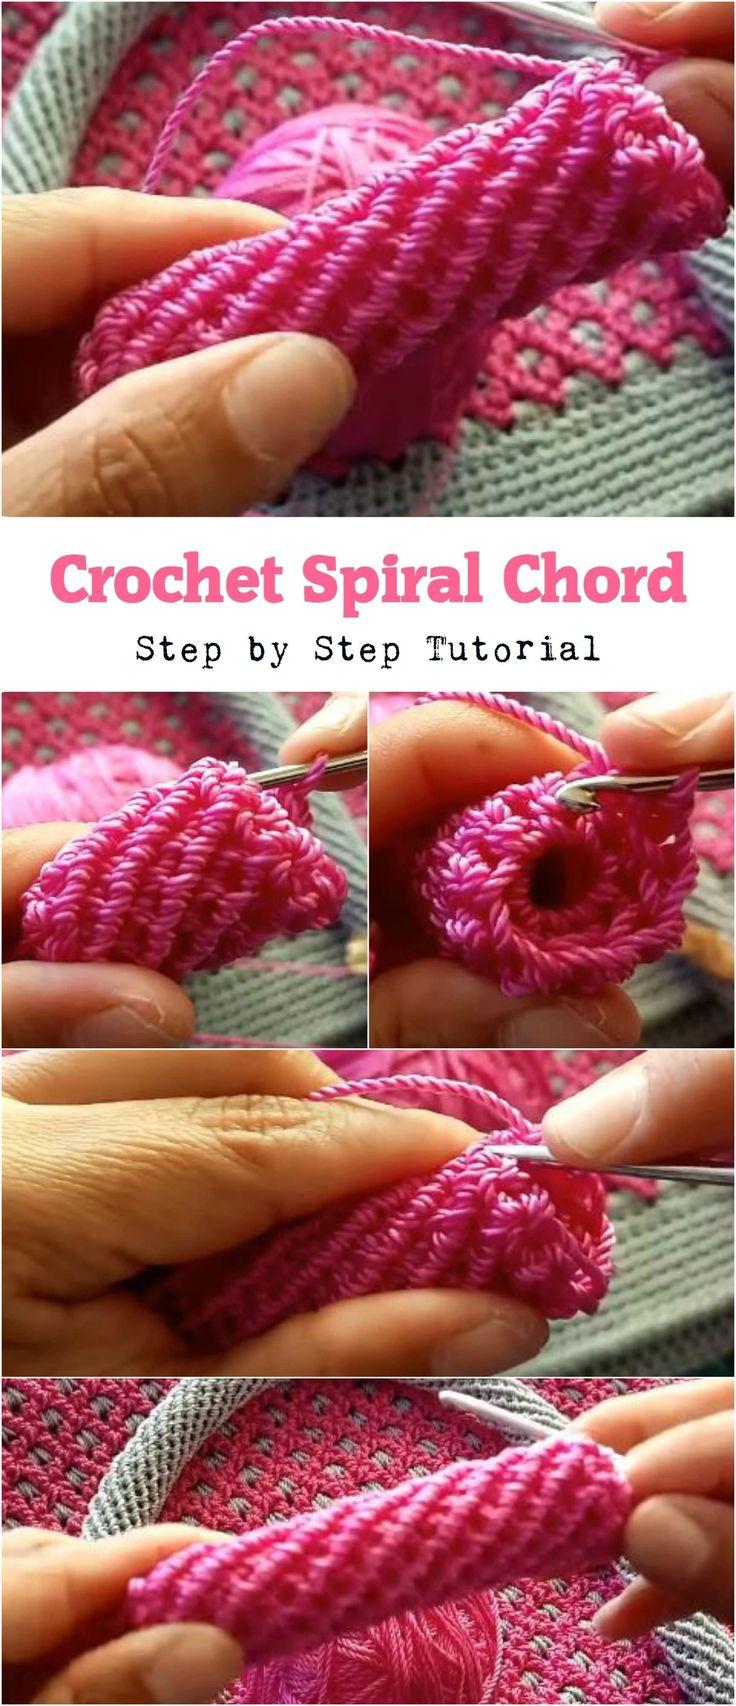 Crochet Spiral Chord